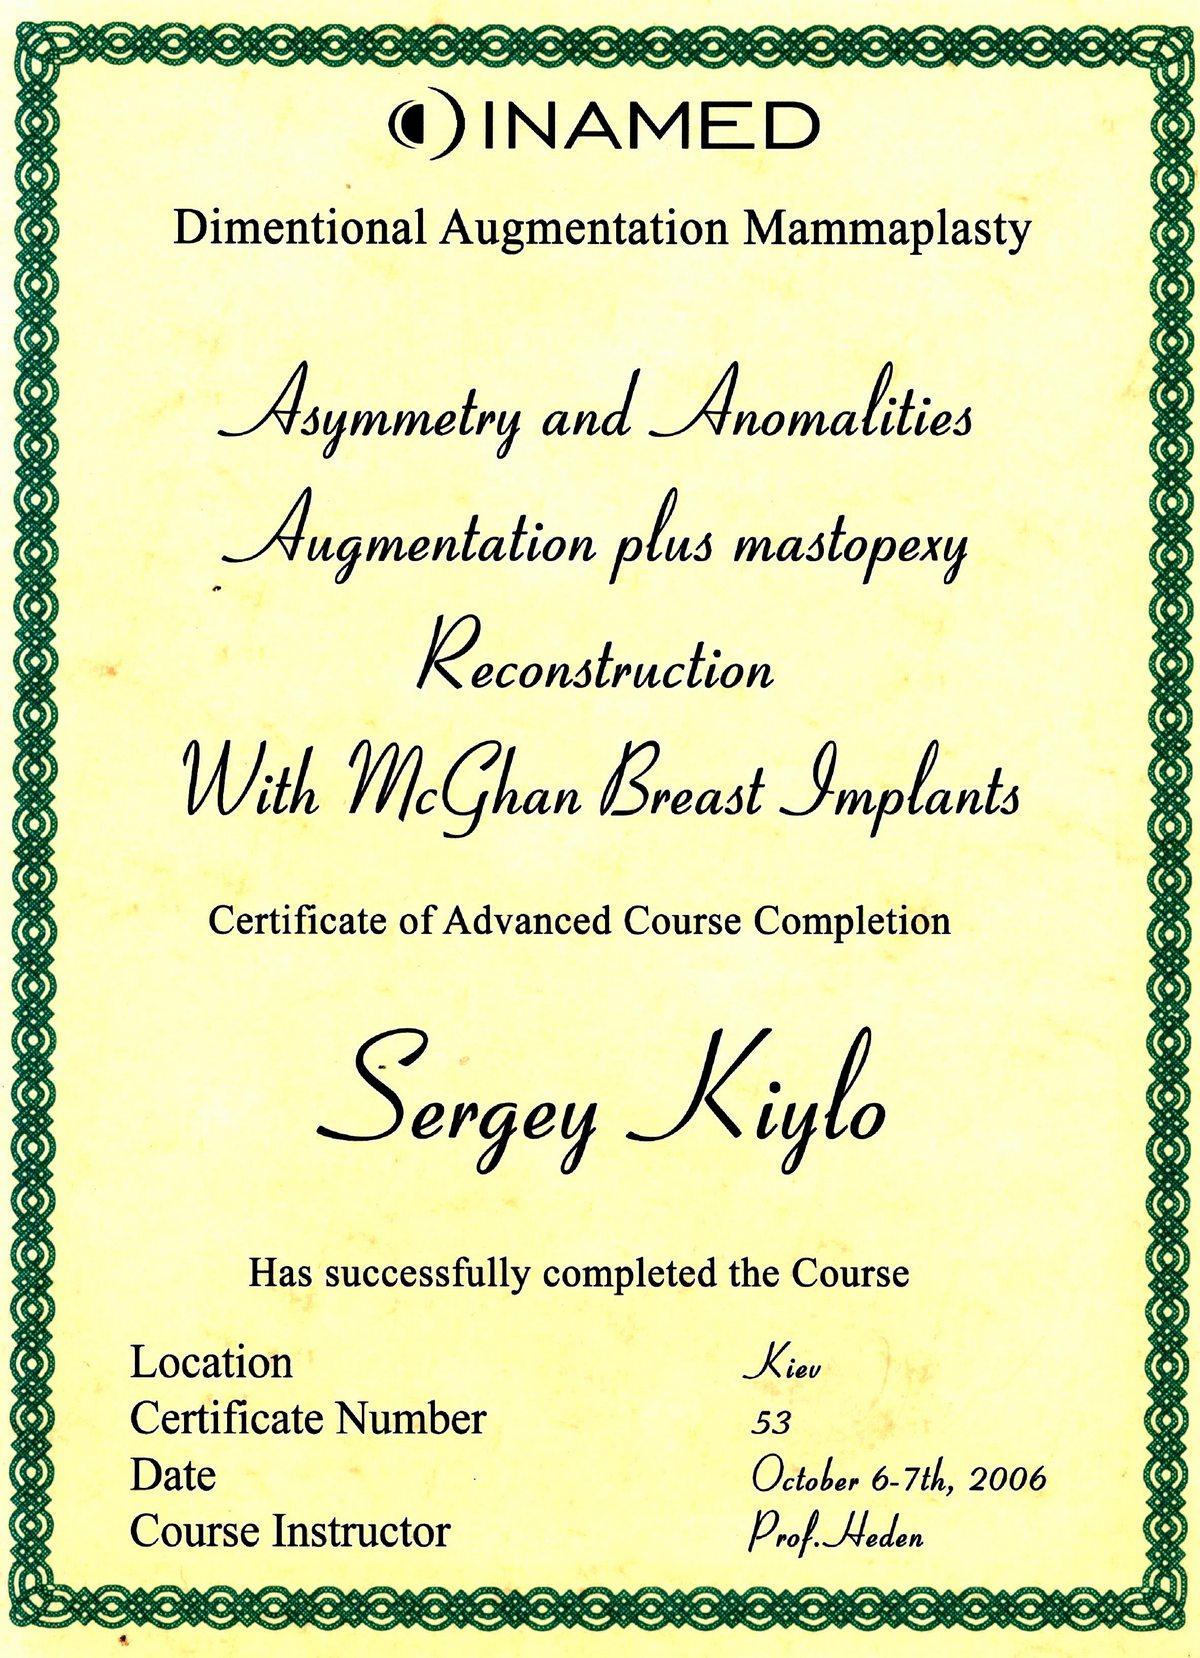 Документ №:7 Сертификат пластического хирурга Кийло Сергея Алексеевича